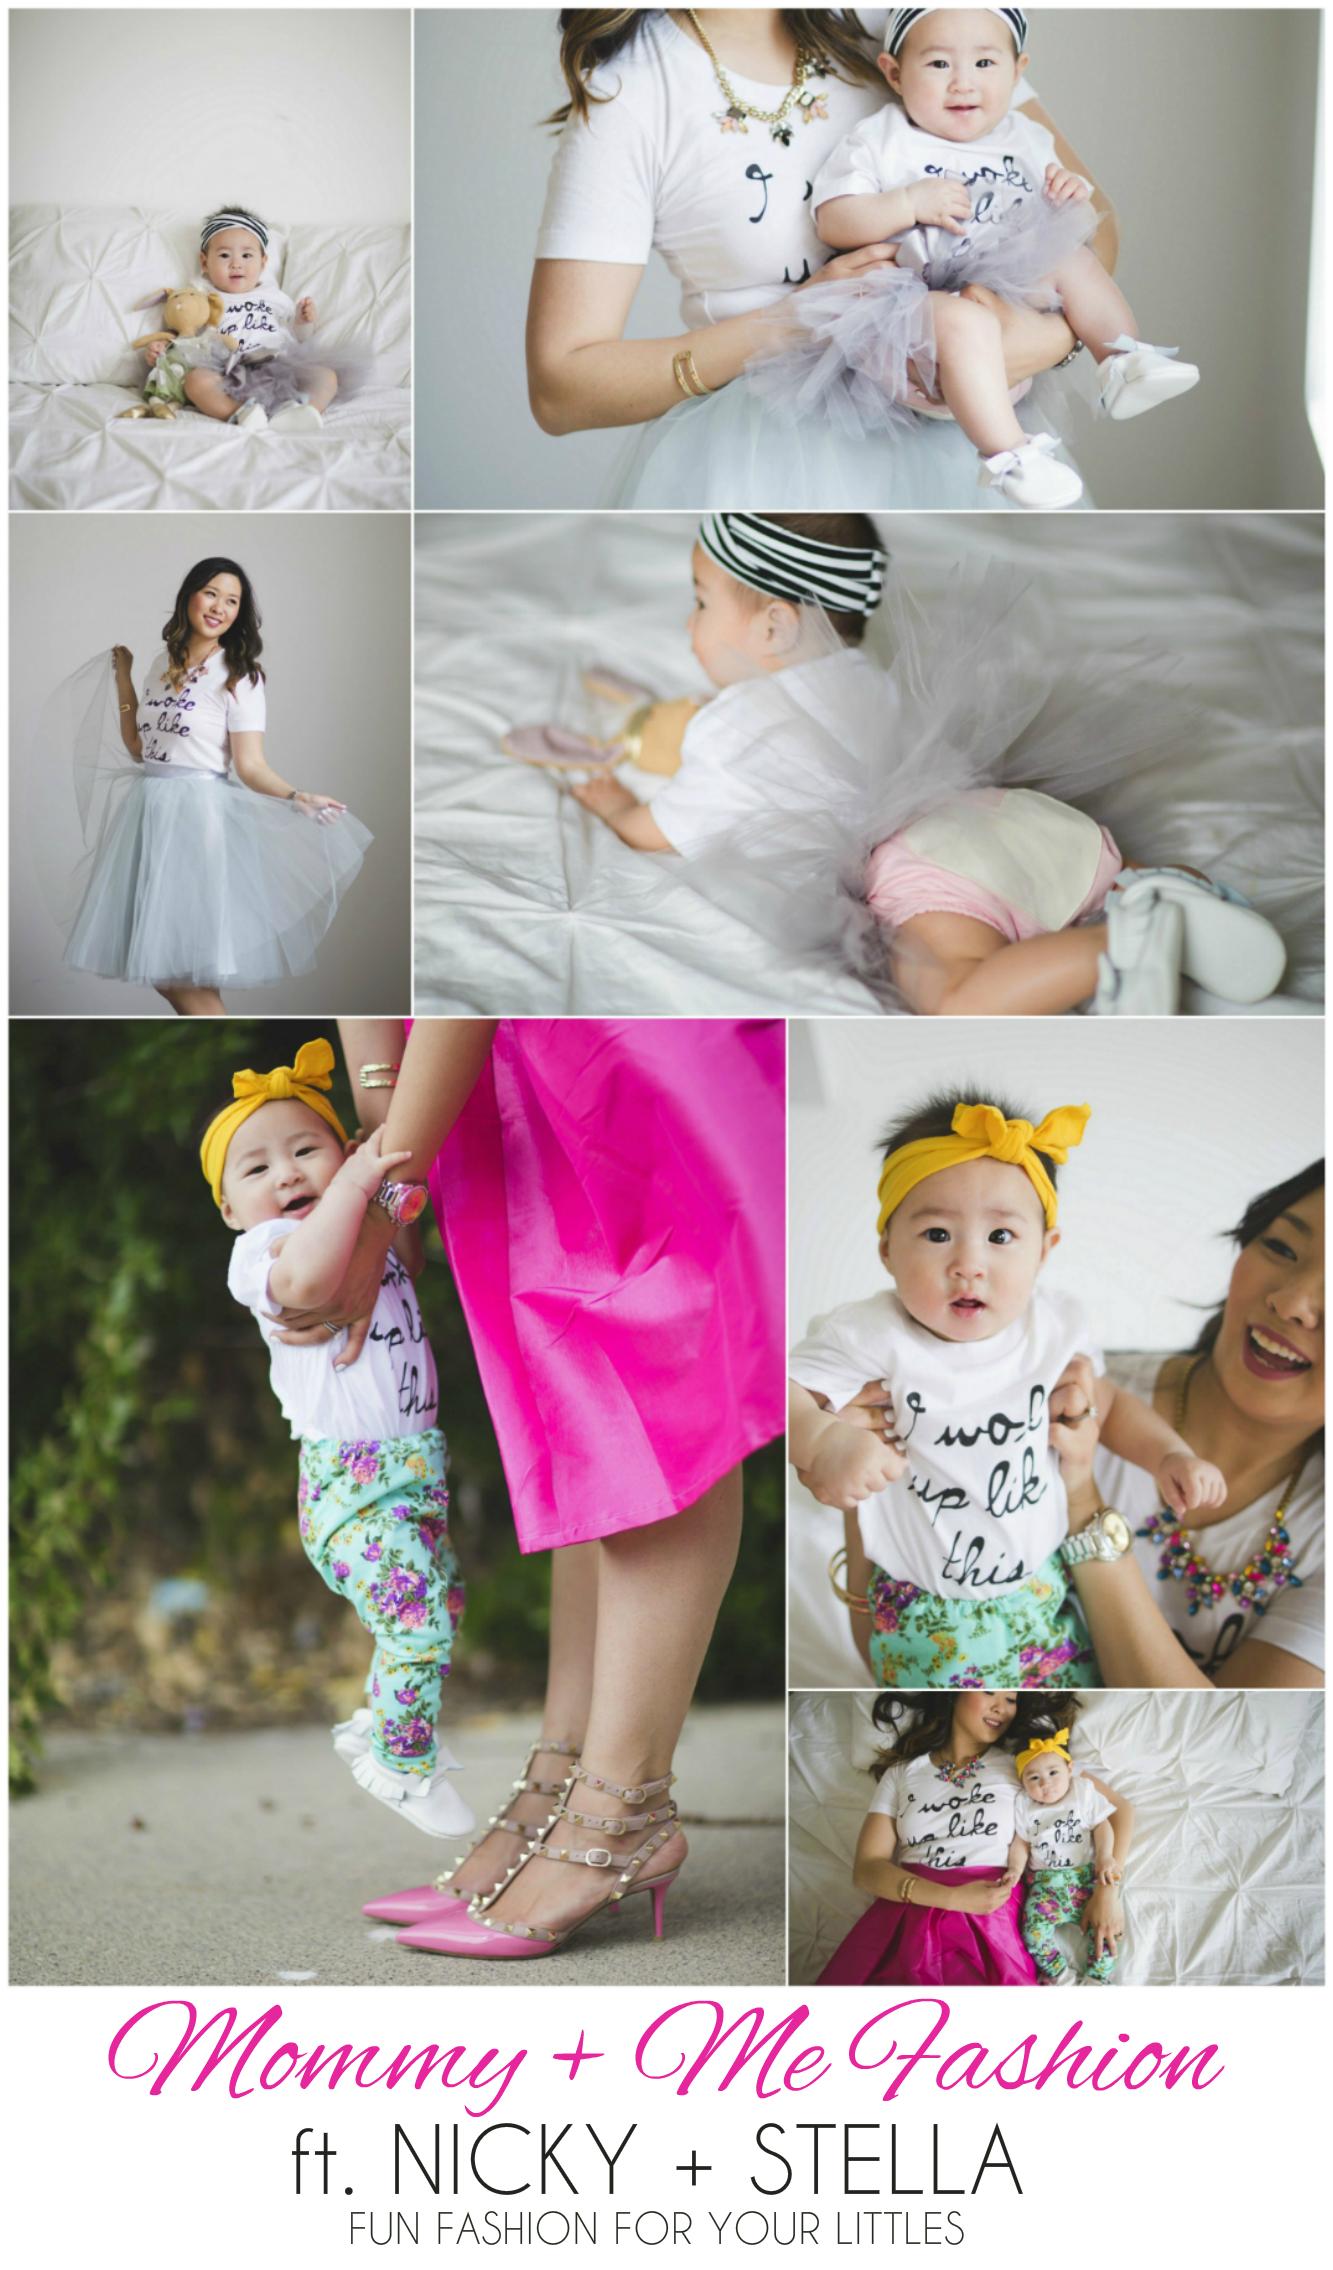 Sandy a la Mode featuring Mommy + Me Fashion by Nicky + Stella